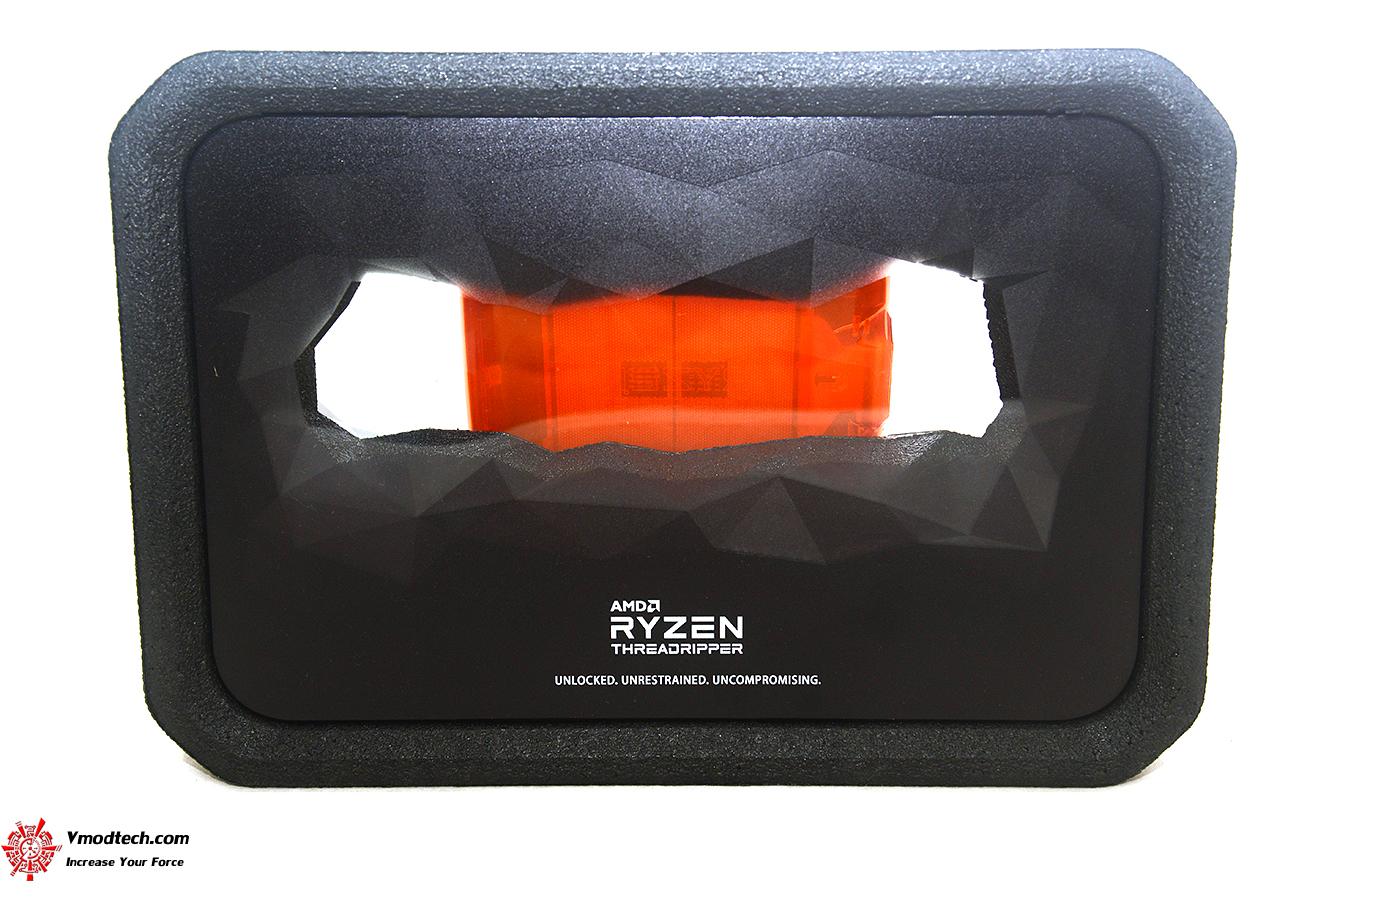 dsc 0485 AMD RYZEN THREADRIPPER 2920X PROCESSOR REVIEW